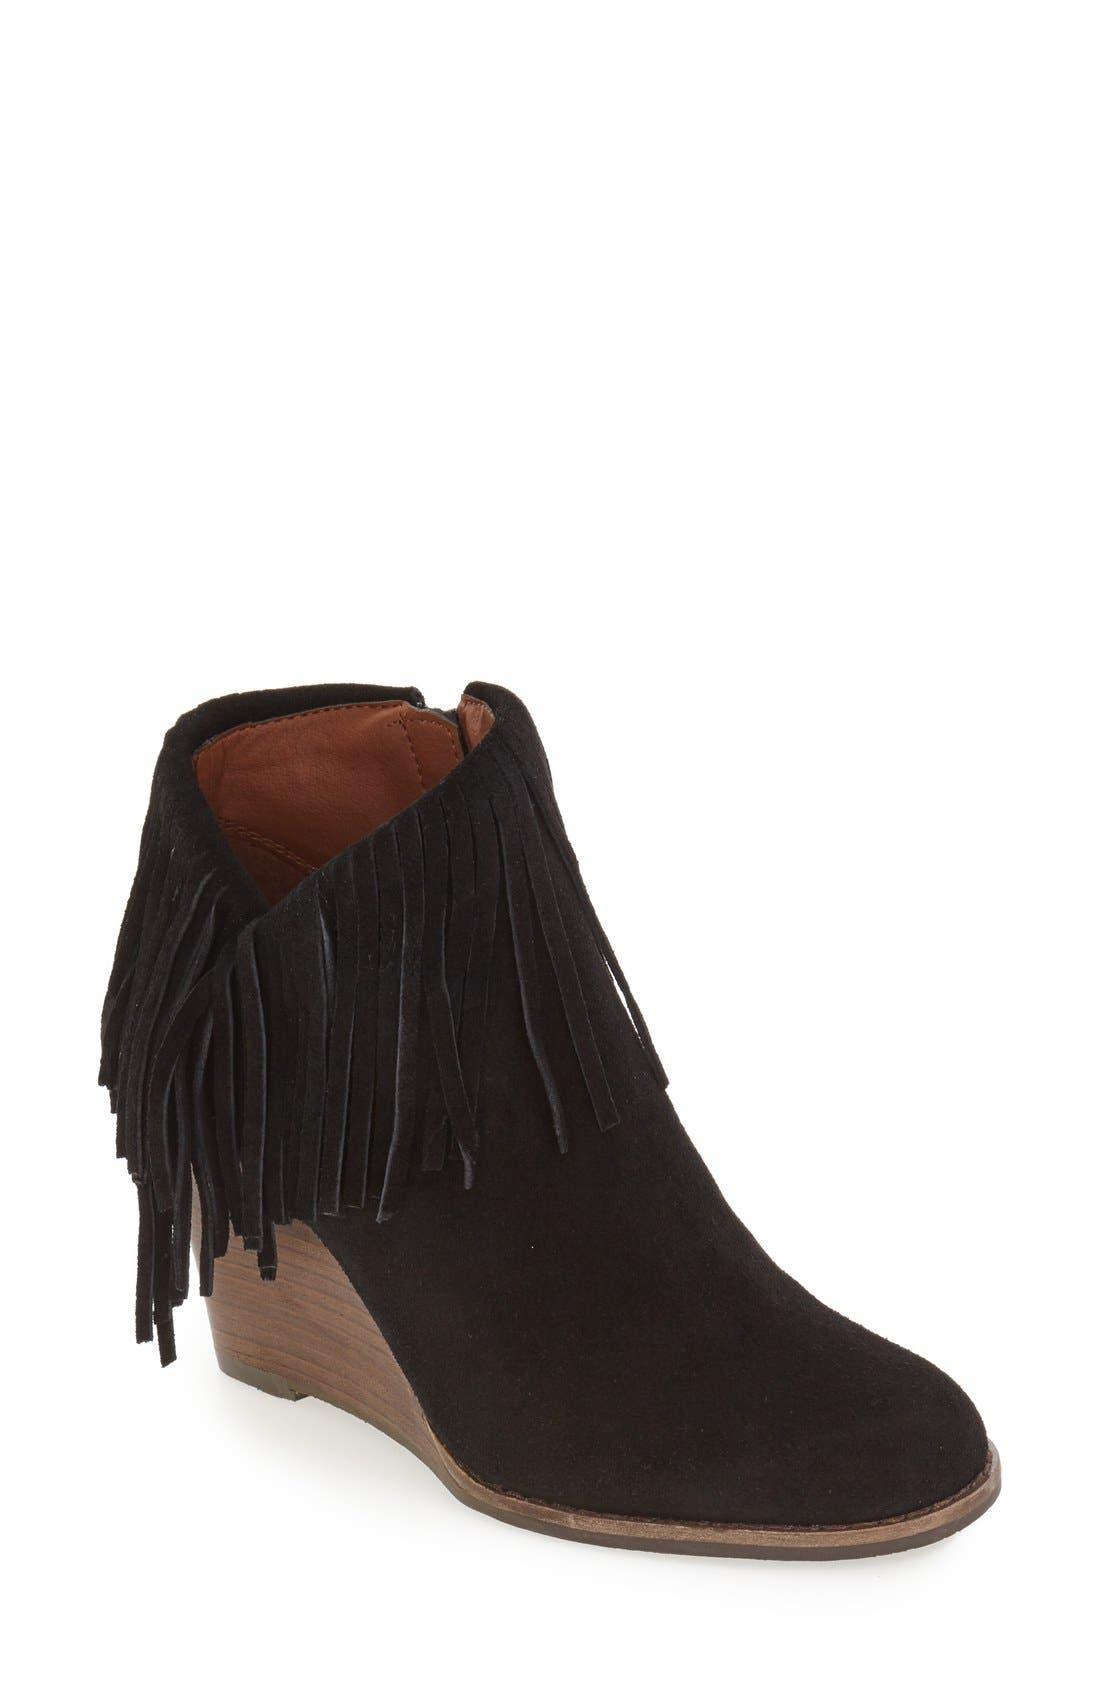 LUCKY BRAND 'Yachin' Boot